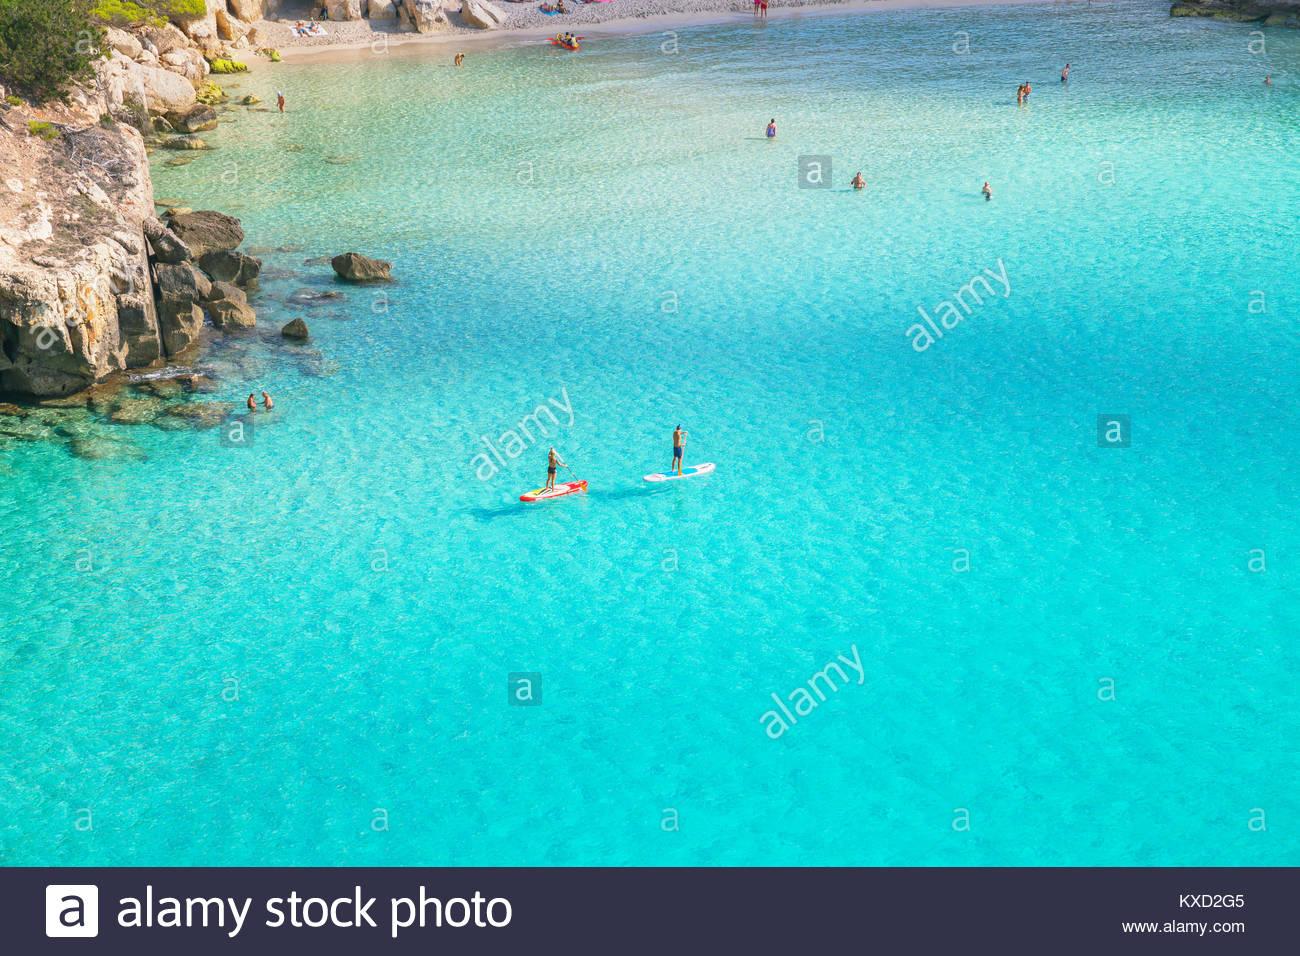 People paddleboarding on the emerald waters of Cala Mitjana,  Menorca, Balearic Islands, Spain - Stock Image